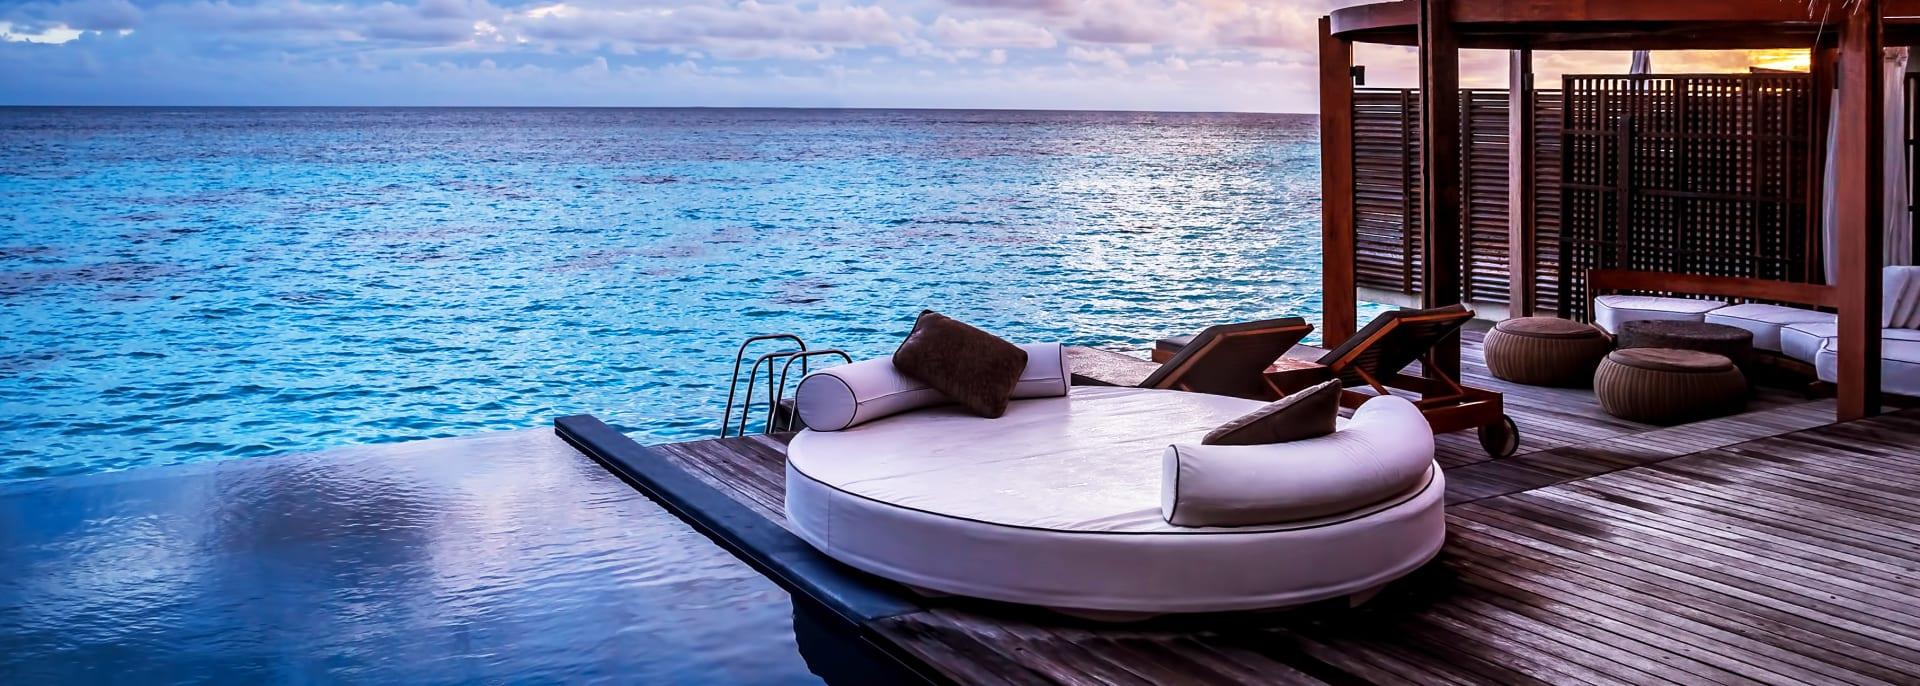 Bungalow Strand, Malediven